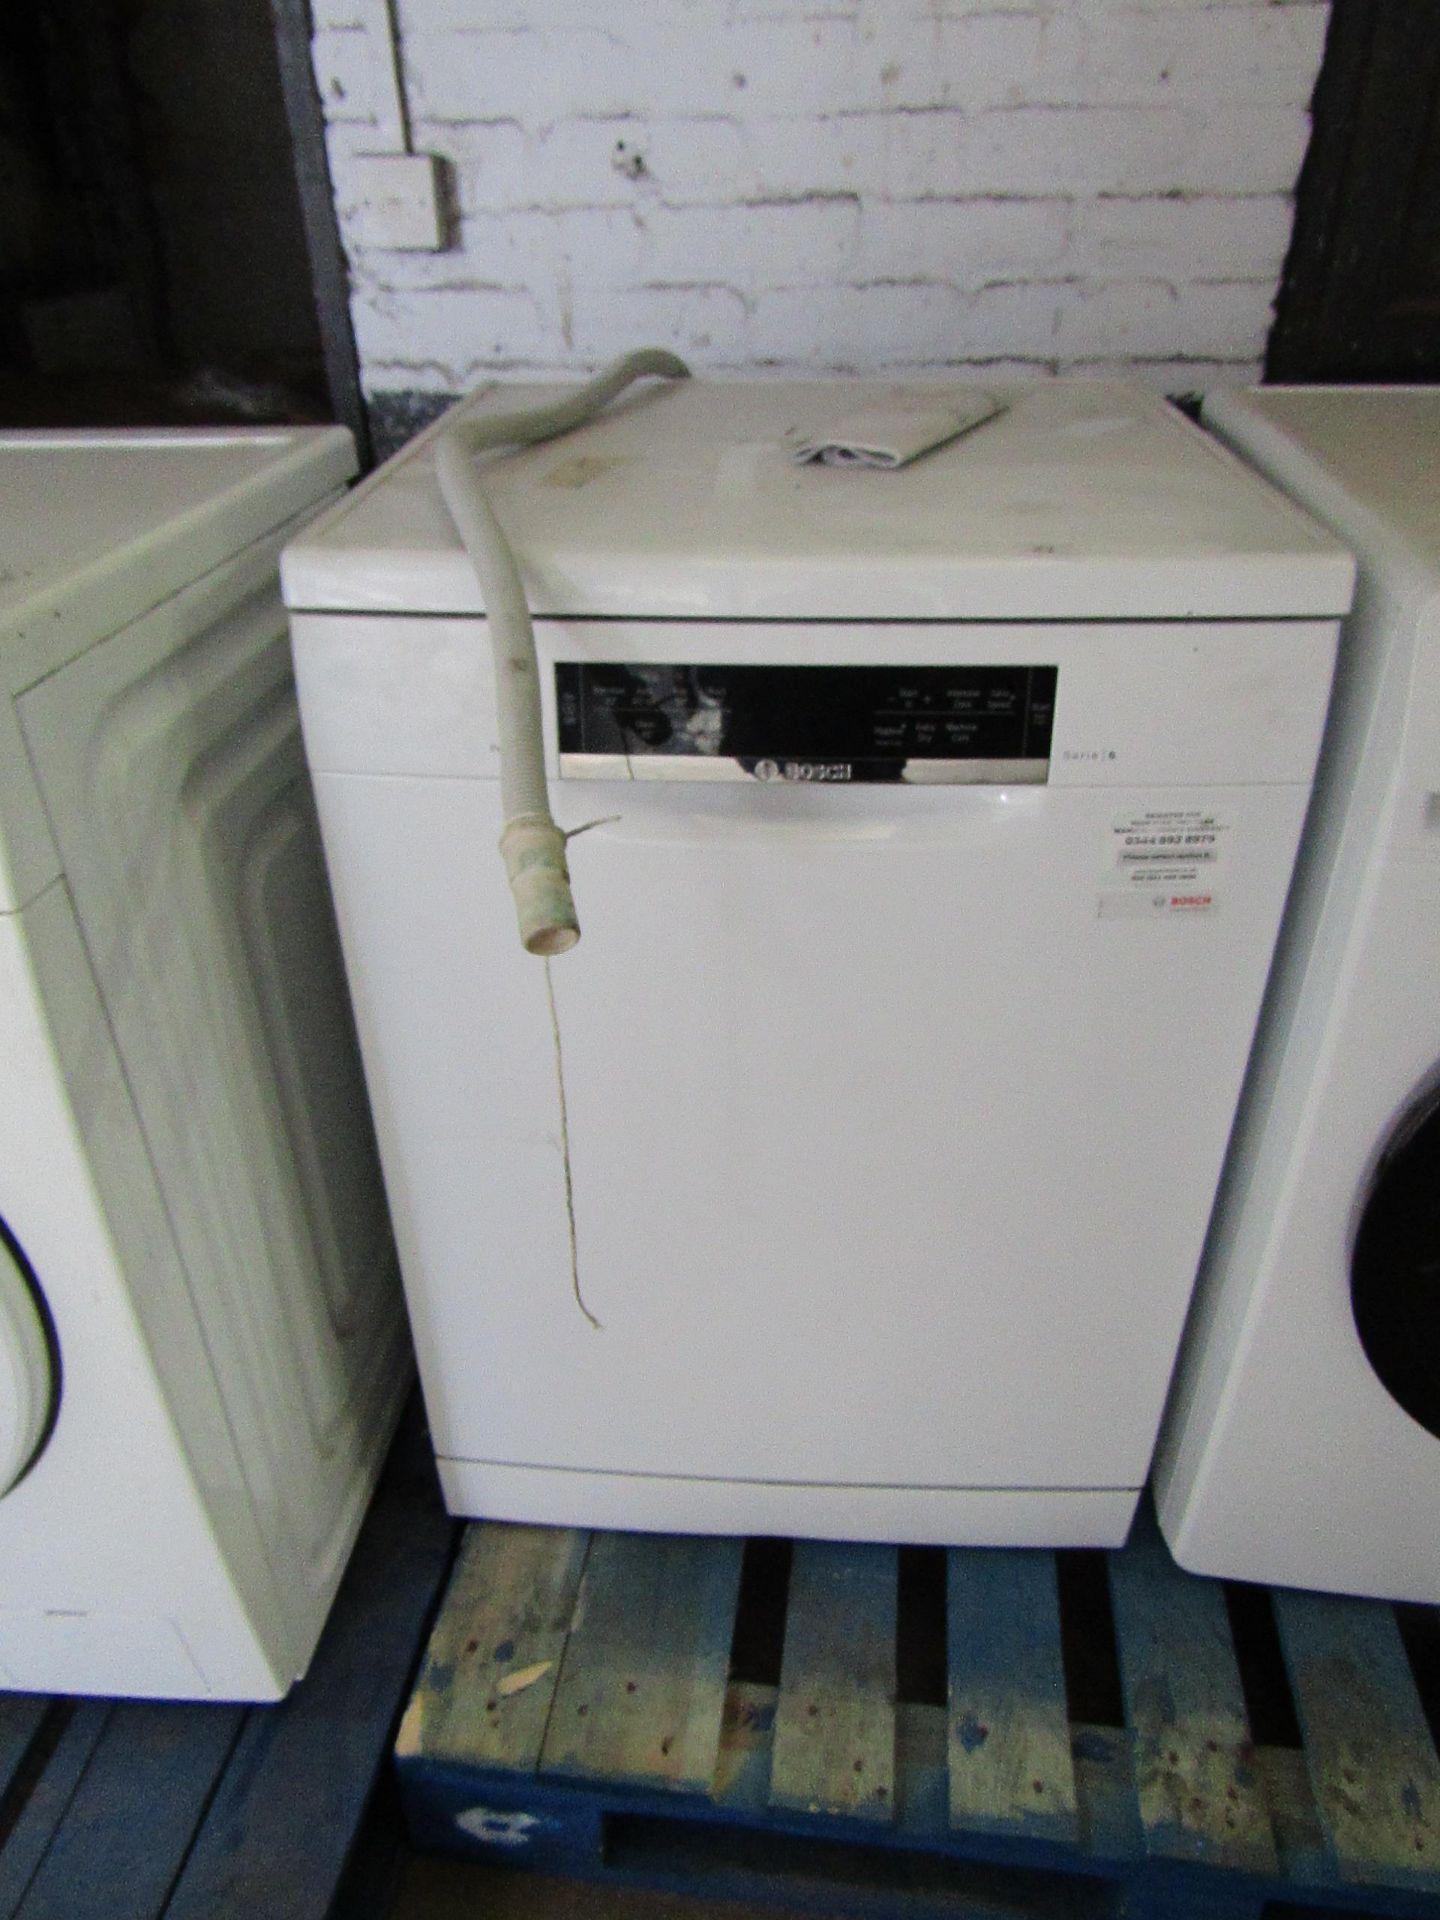 BoschPerfect Dry |Series 6 dishwasher, no plug